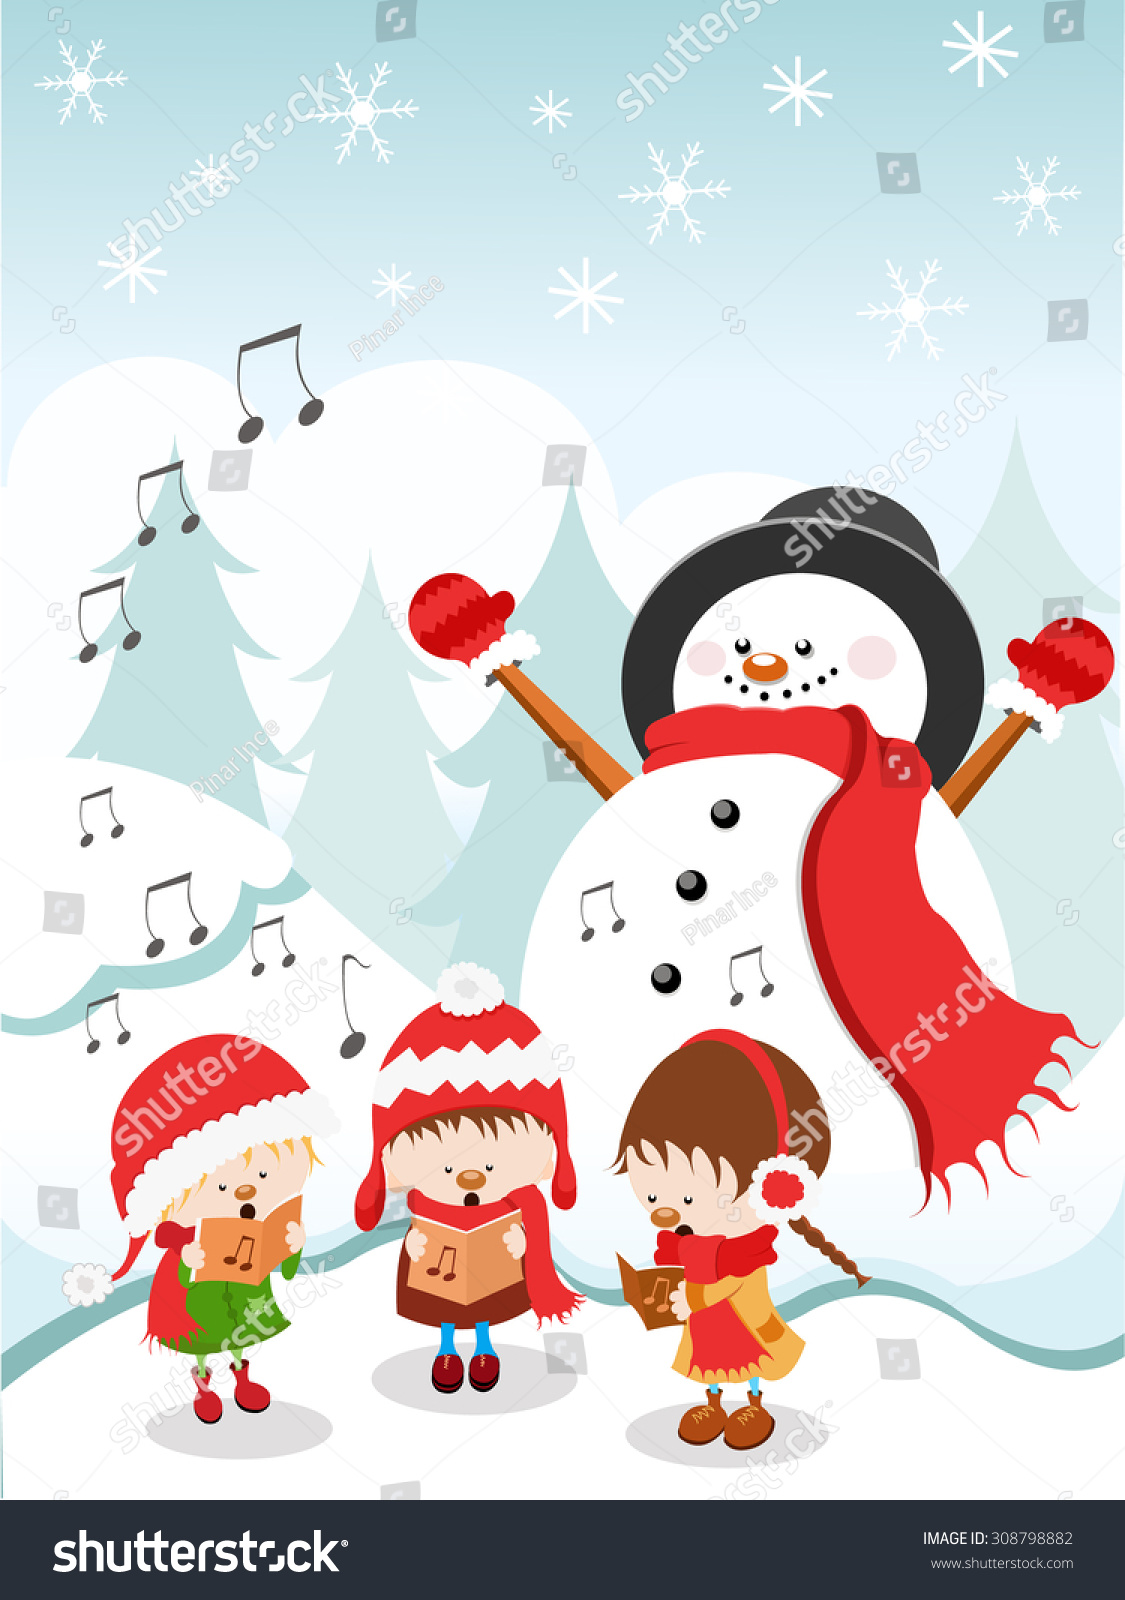 Kids Singing Christmas Songs Stock Vector (Royalty Free) 308798882 ...